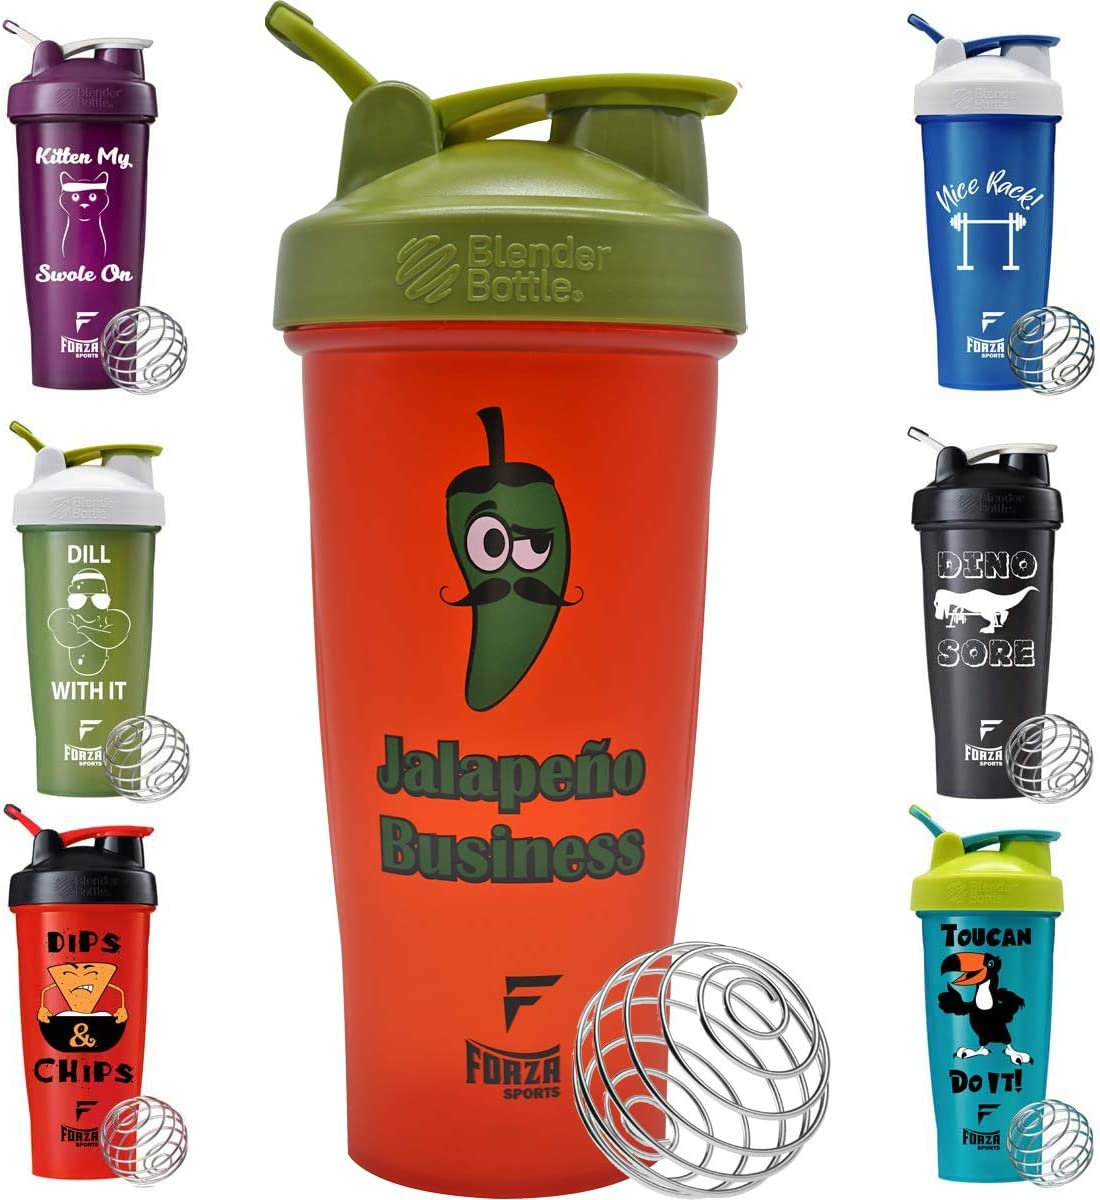 Blender Bottle x Forza Sports 28 oz. Classic Shaker - Jalapeno Business